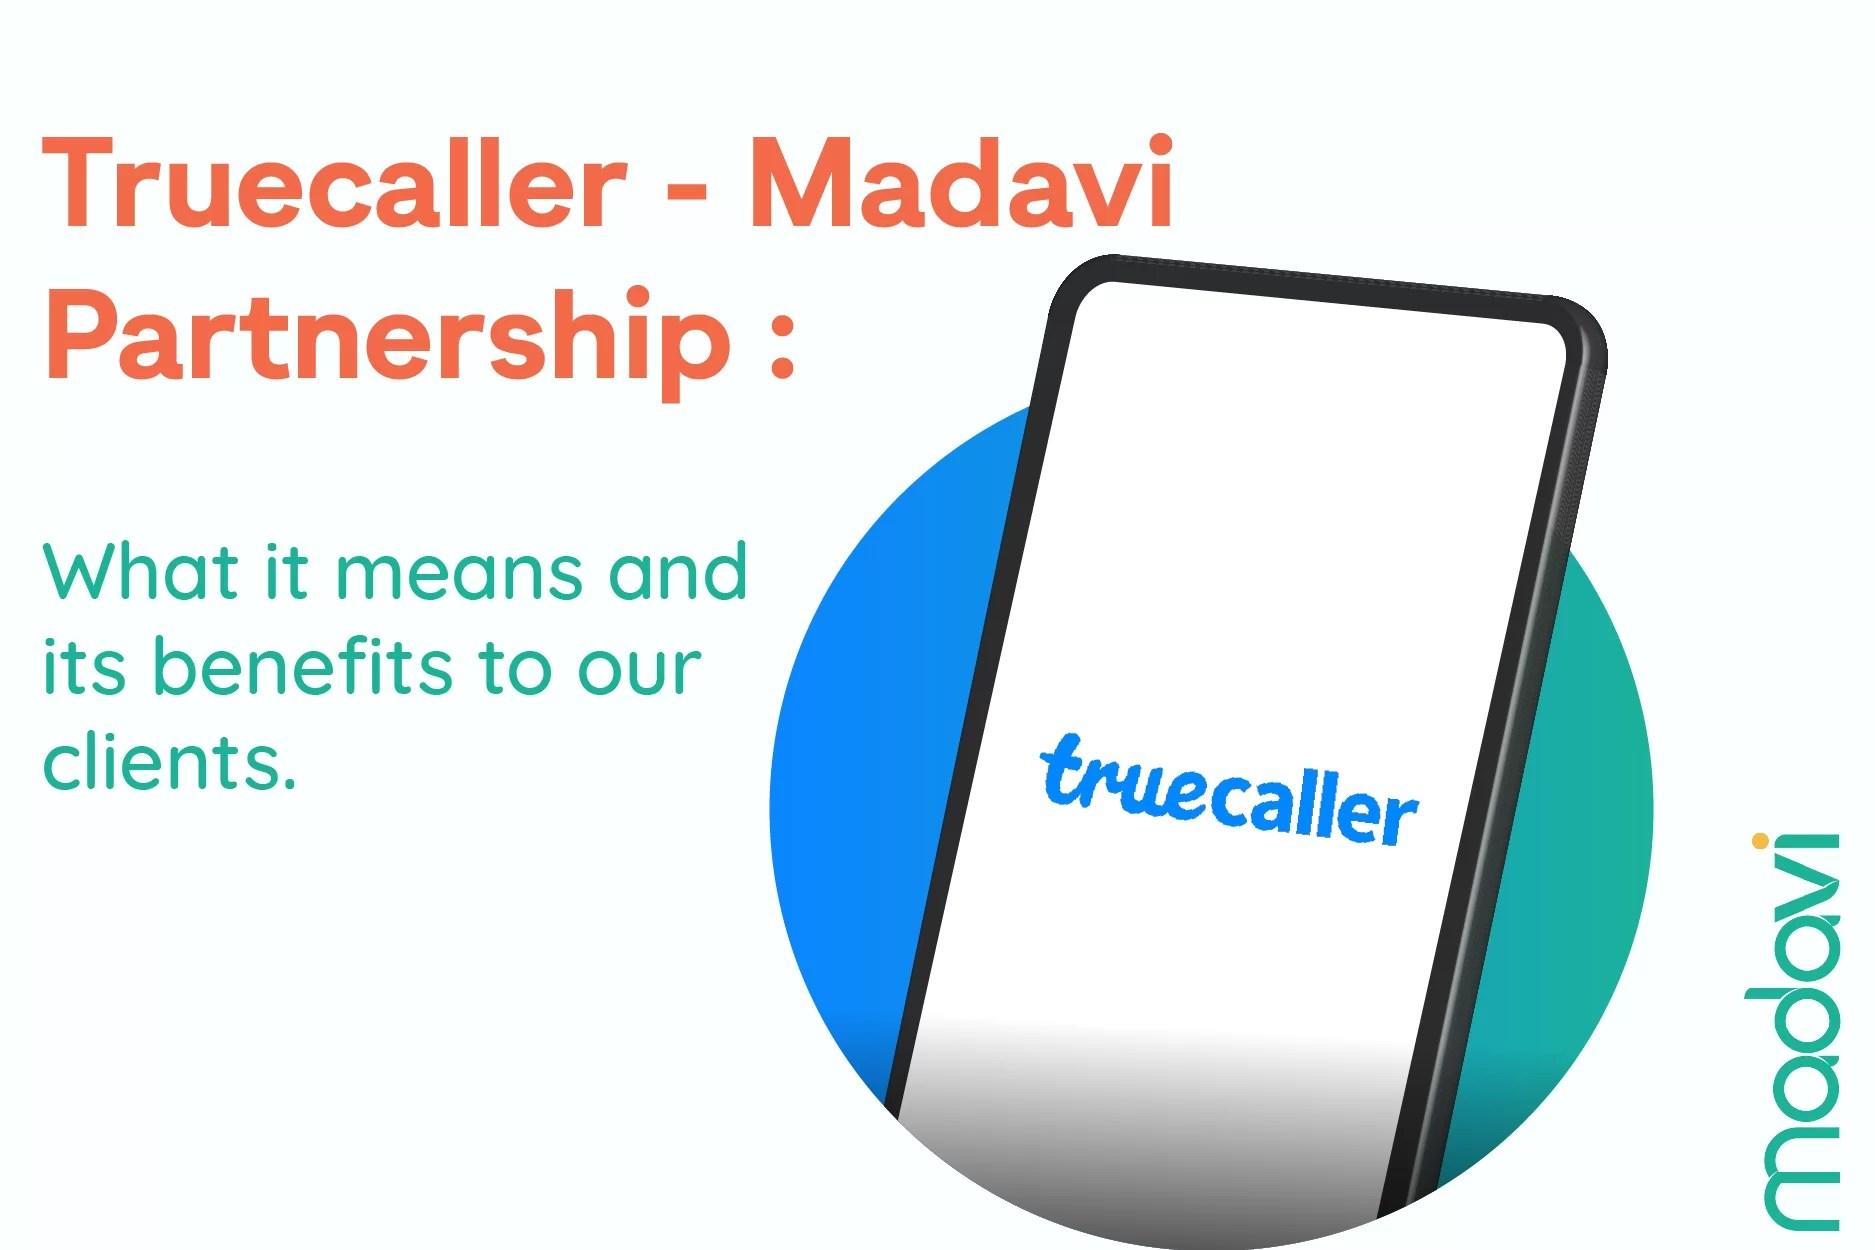 Truecaller and Madavi Partnership